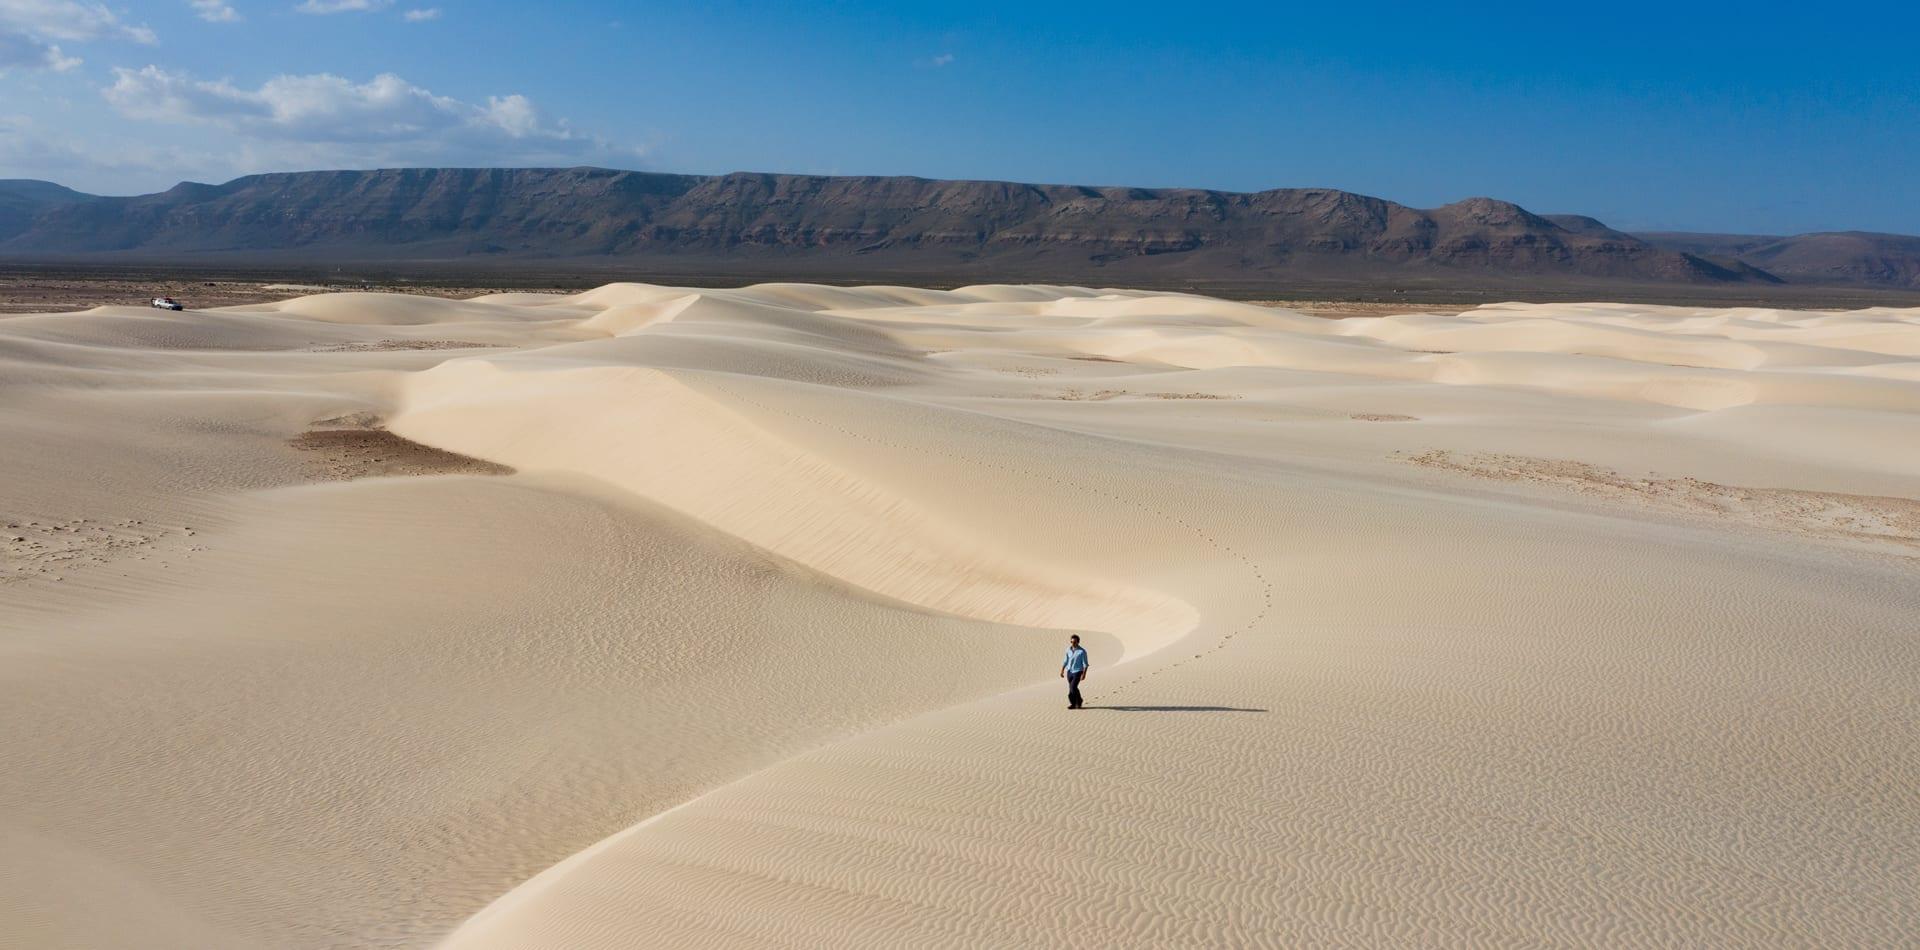 Socotra's deceiving desert landscape hides exotic flora and fauna